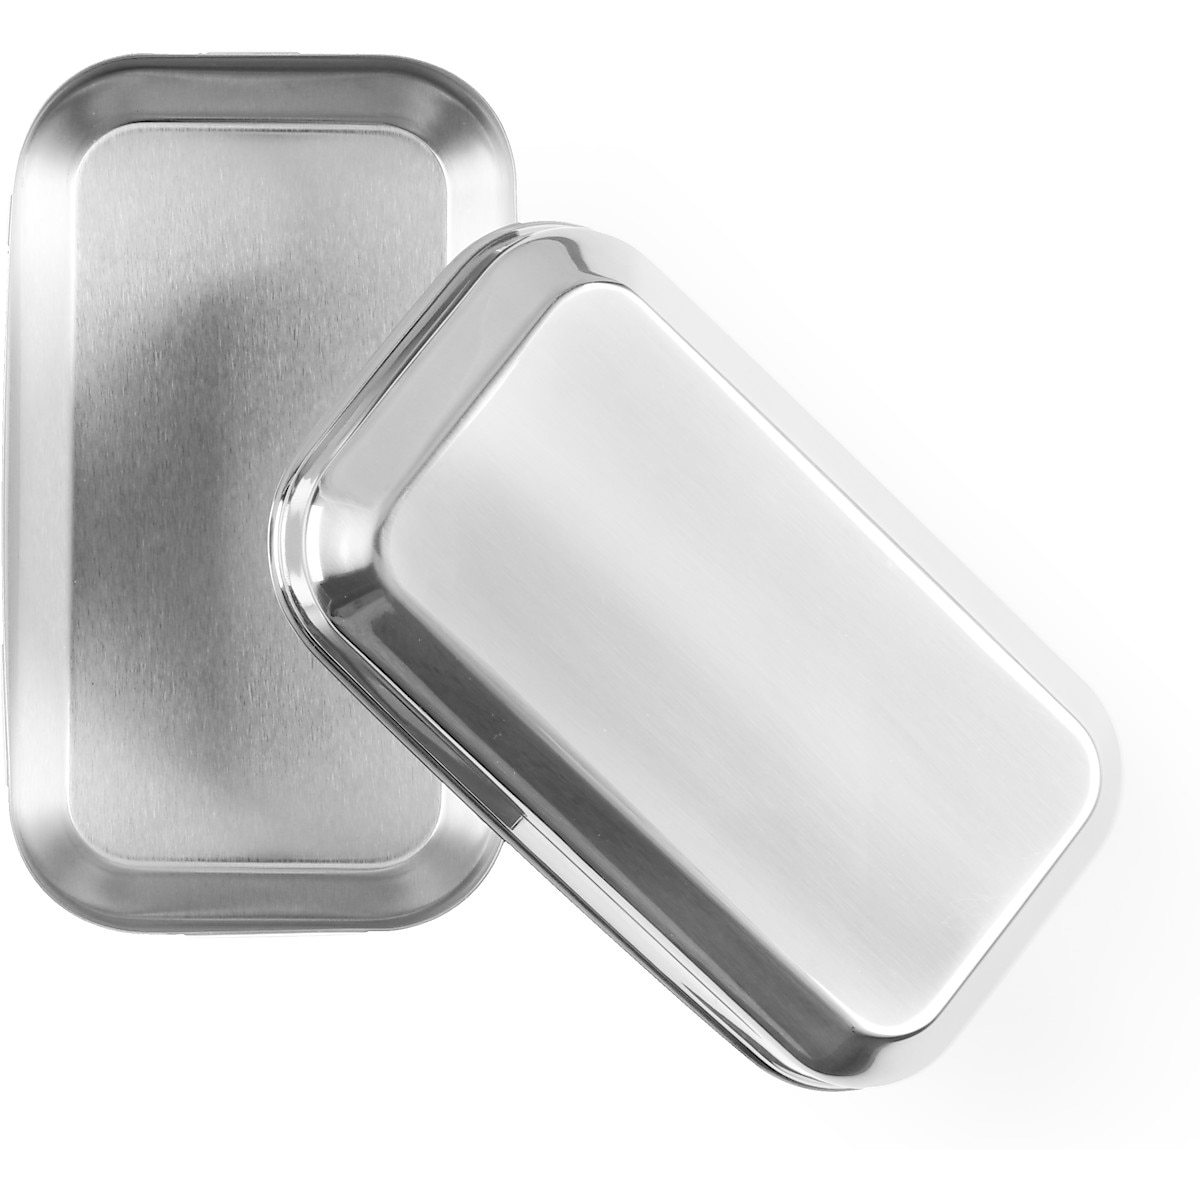 Matlåda i rostfritt stål